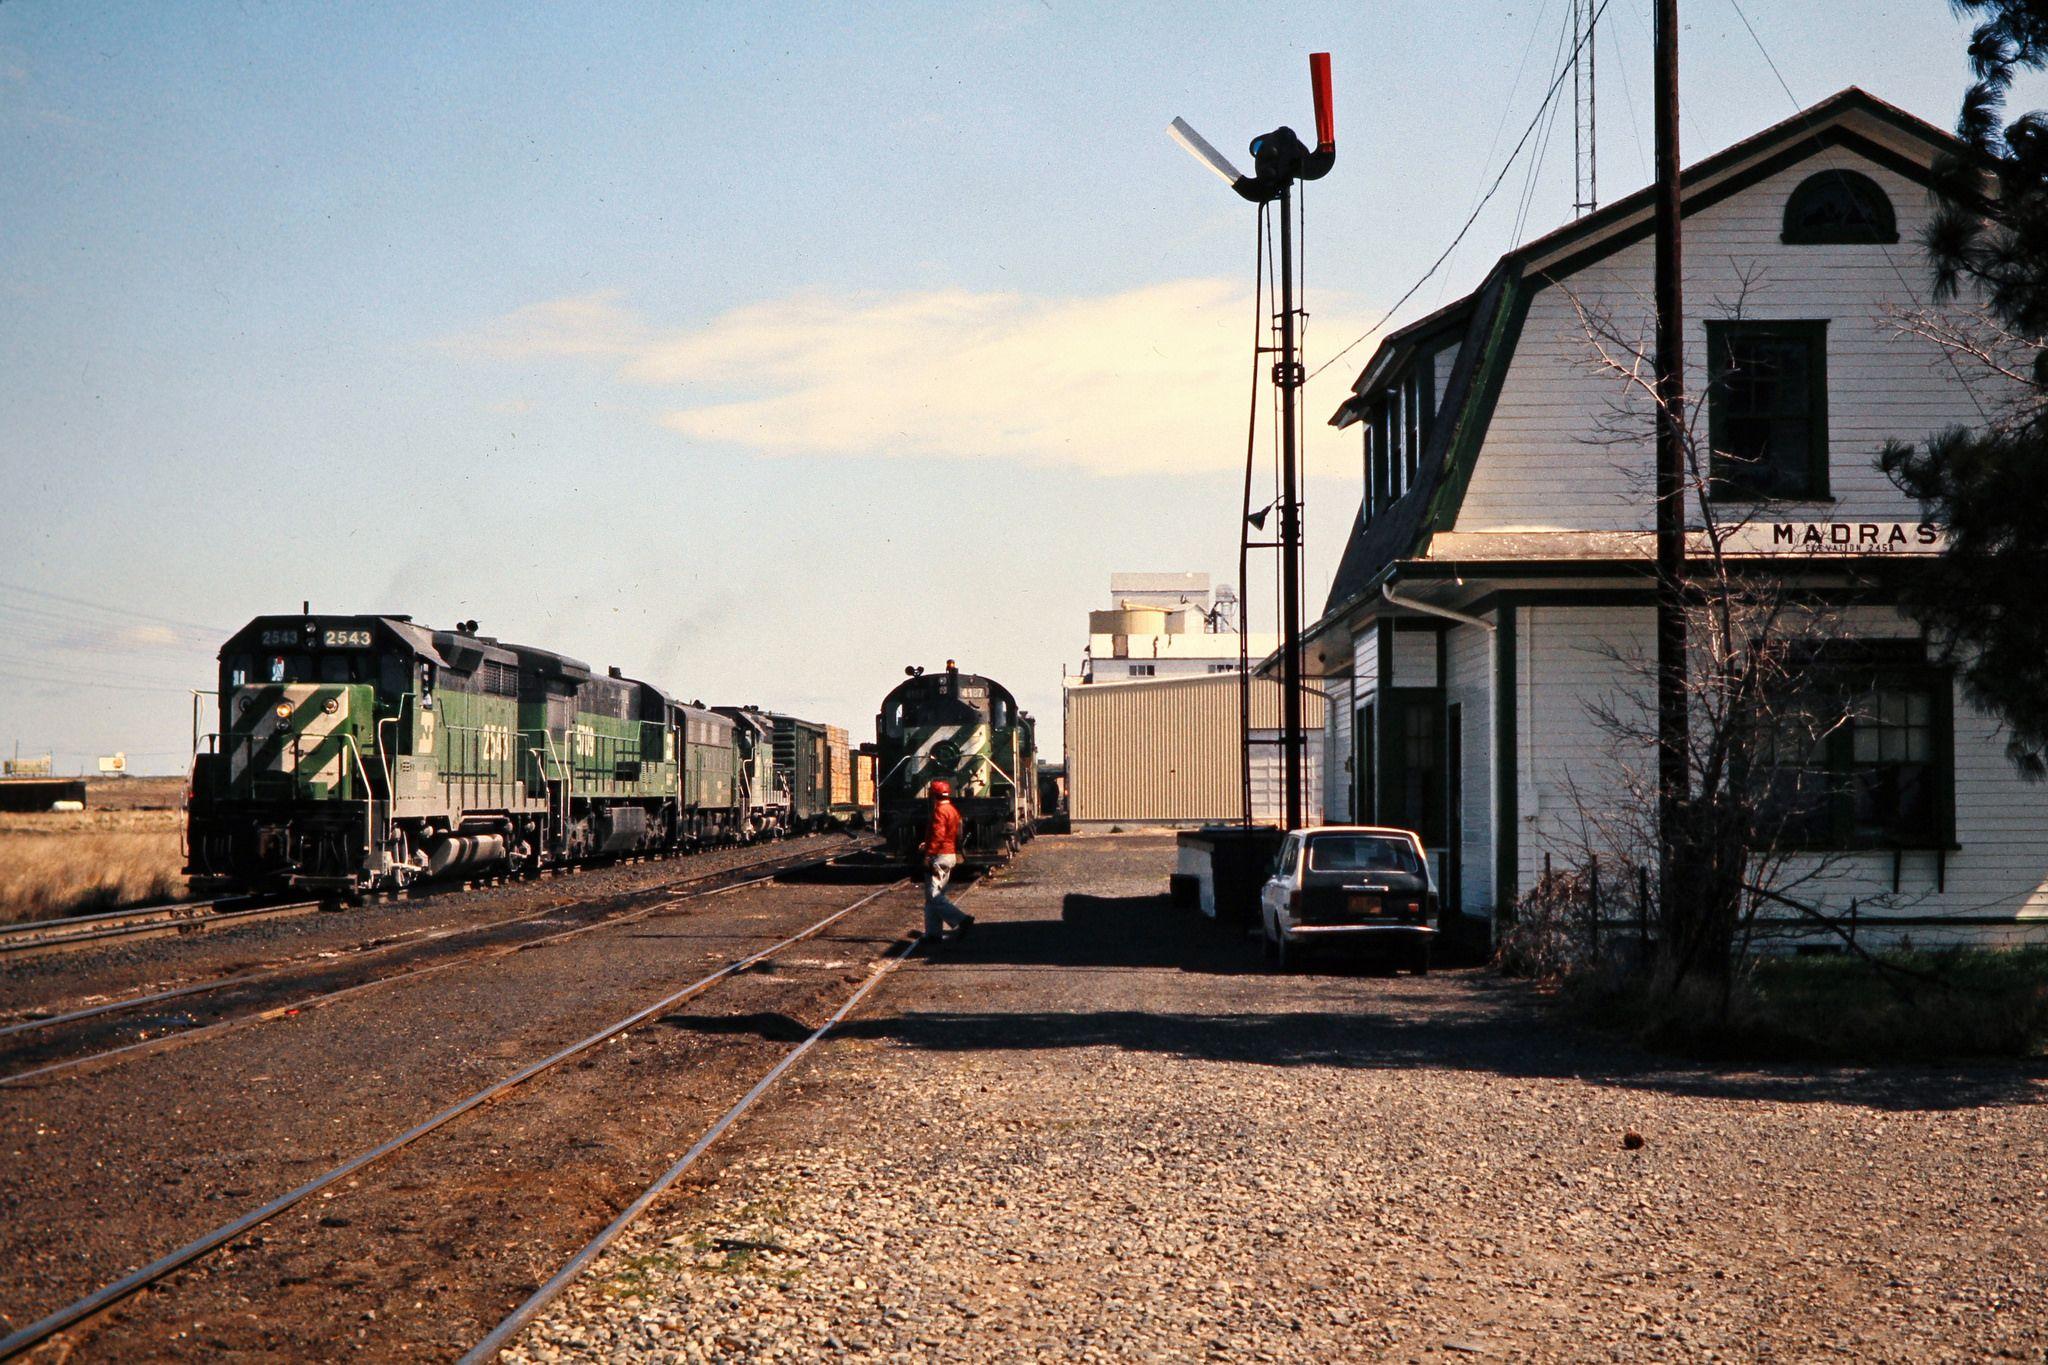 BN, Madras, Oregon, 1975 Southbound Burlington Northern